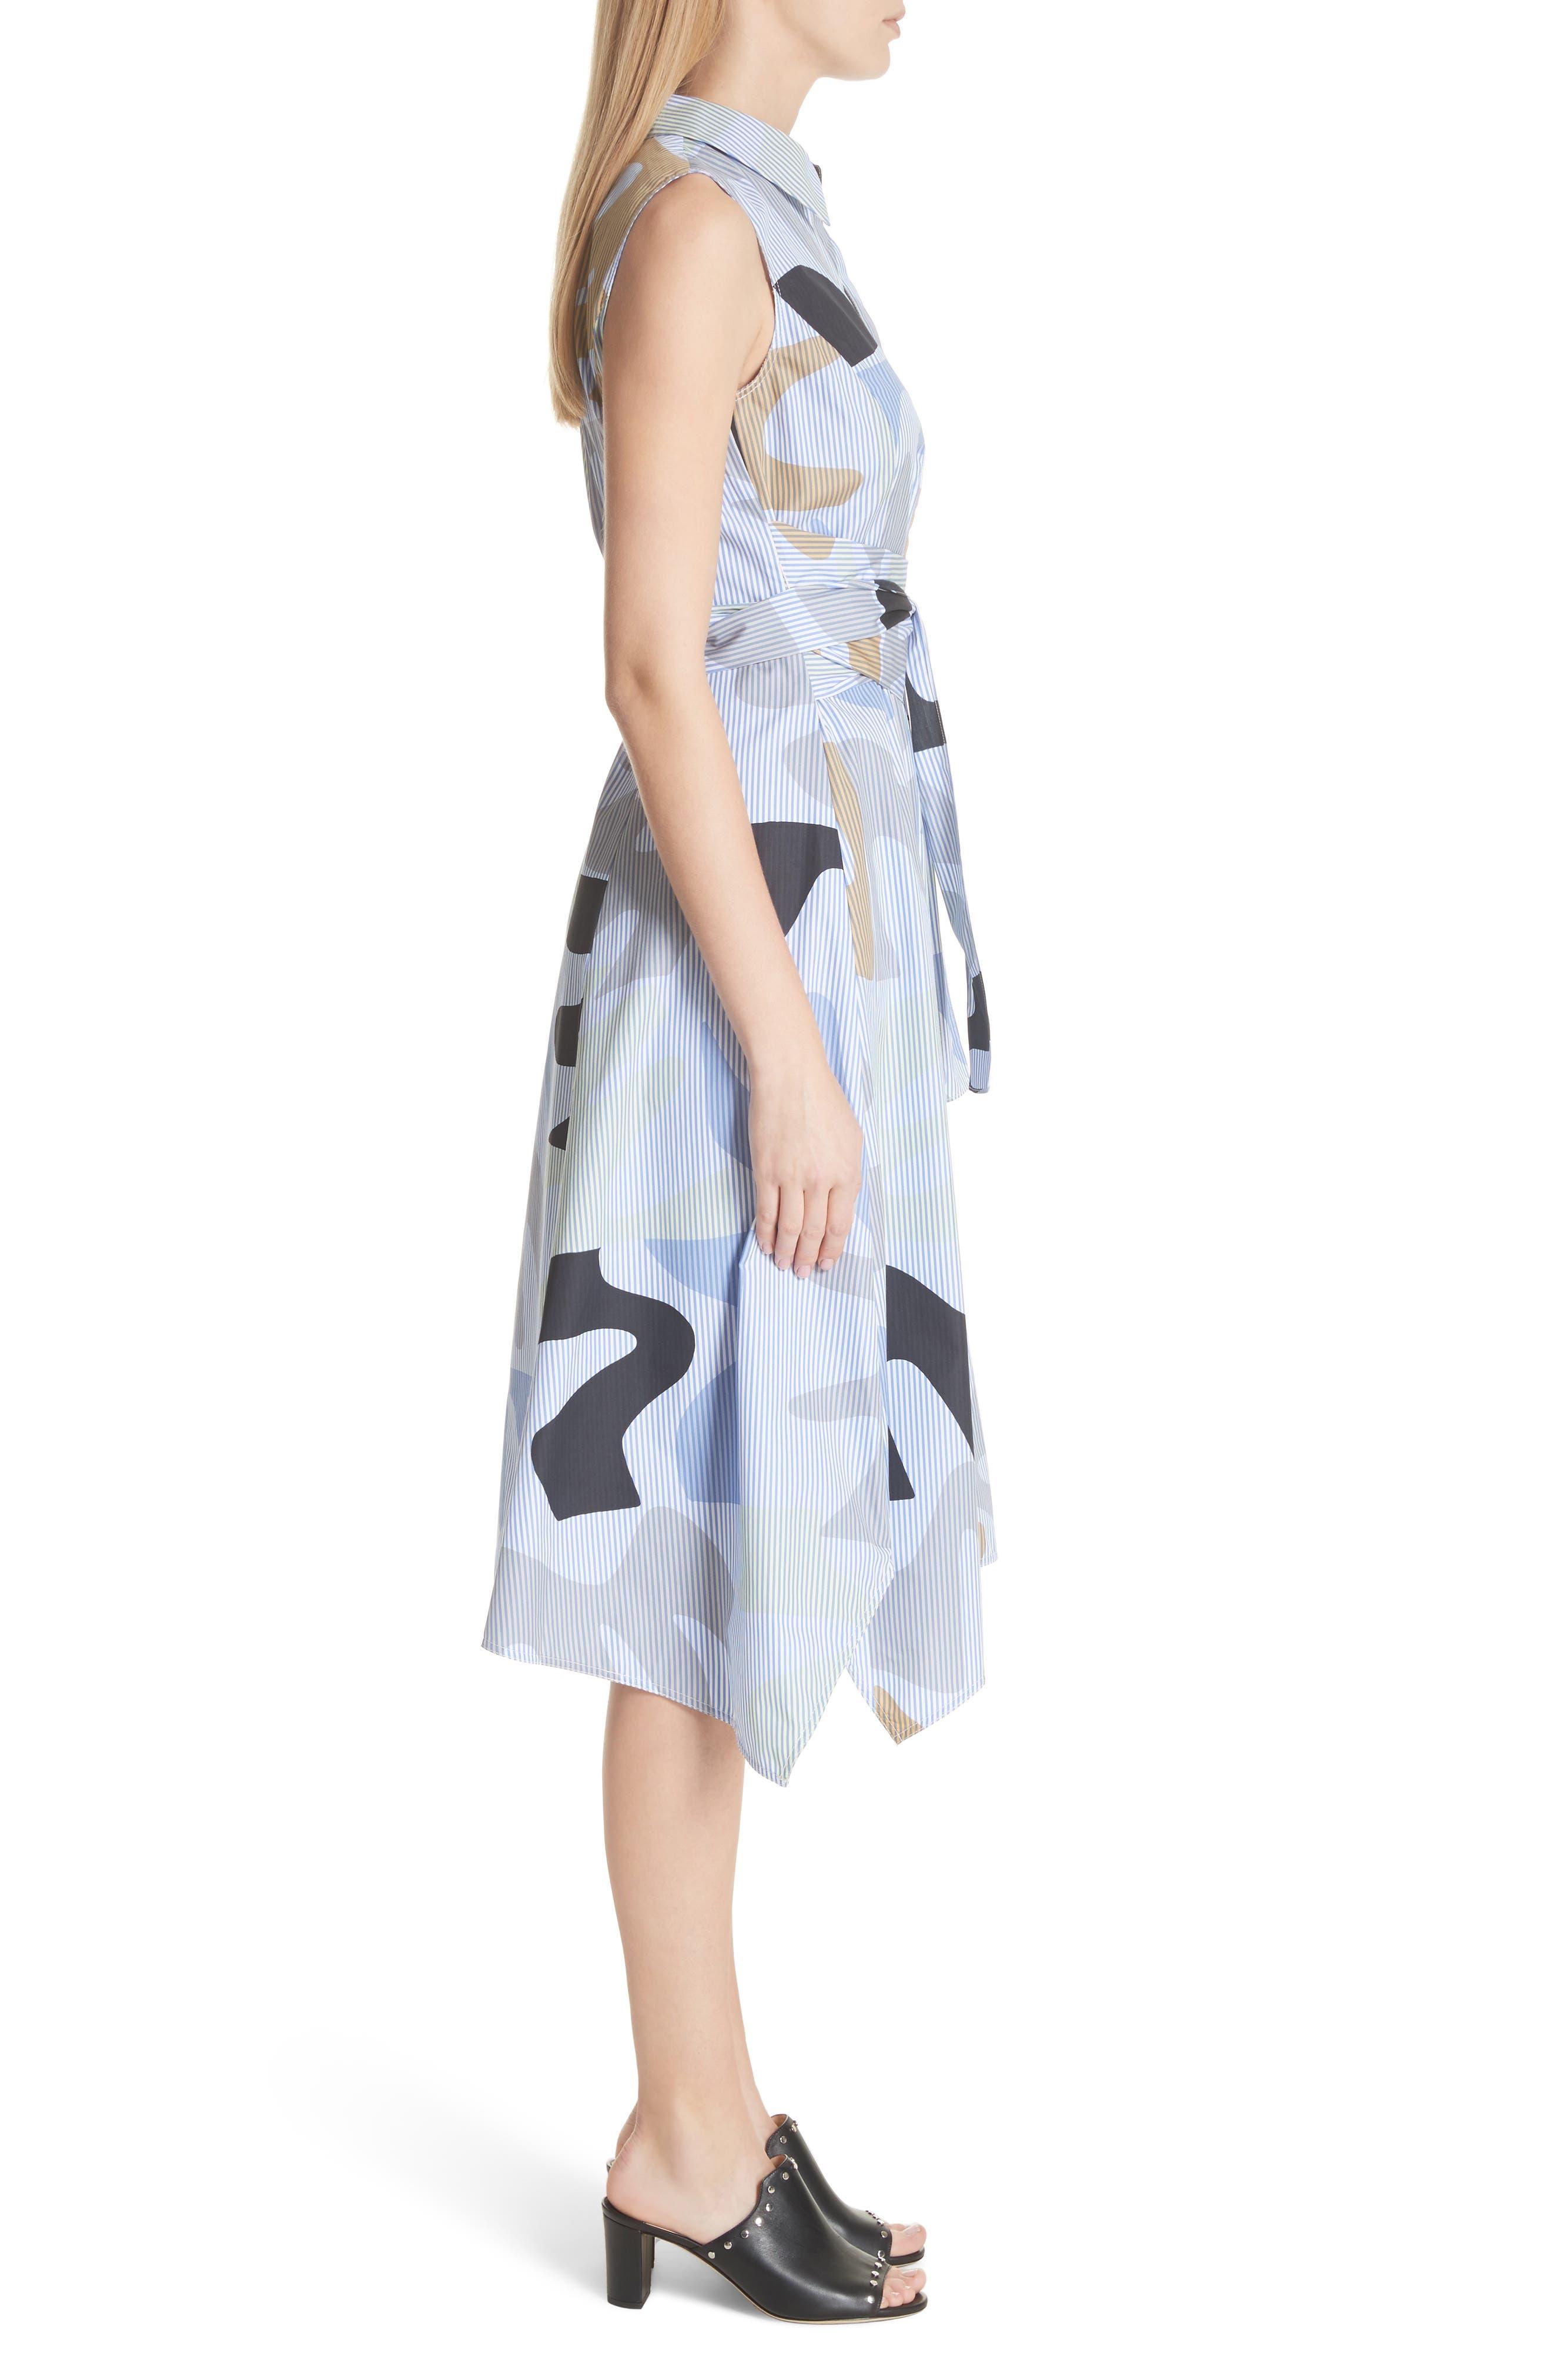 Cordelia Urban Ethos Stripe Dress,                             Alternate thumbnail 3, color,                             Periwinkle Multi